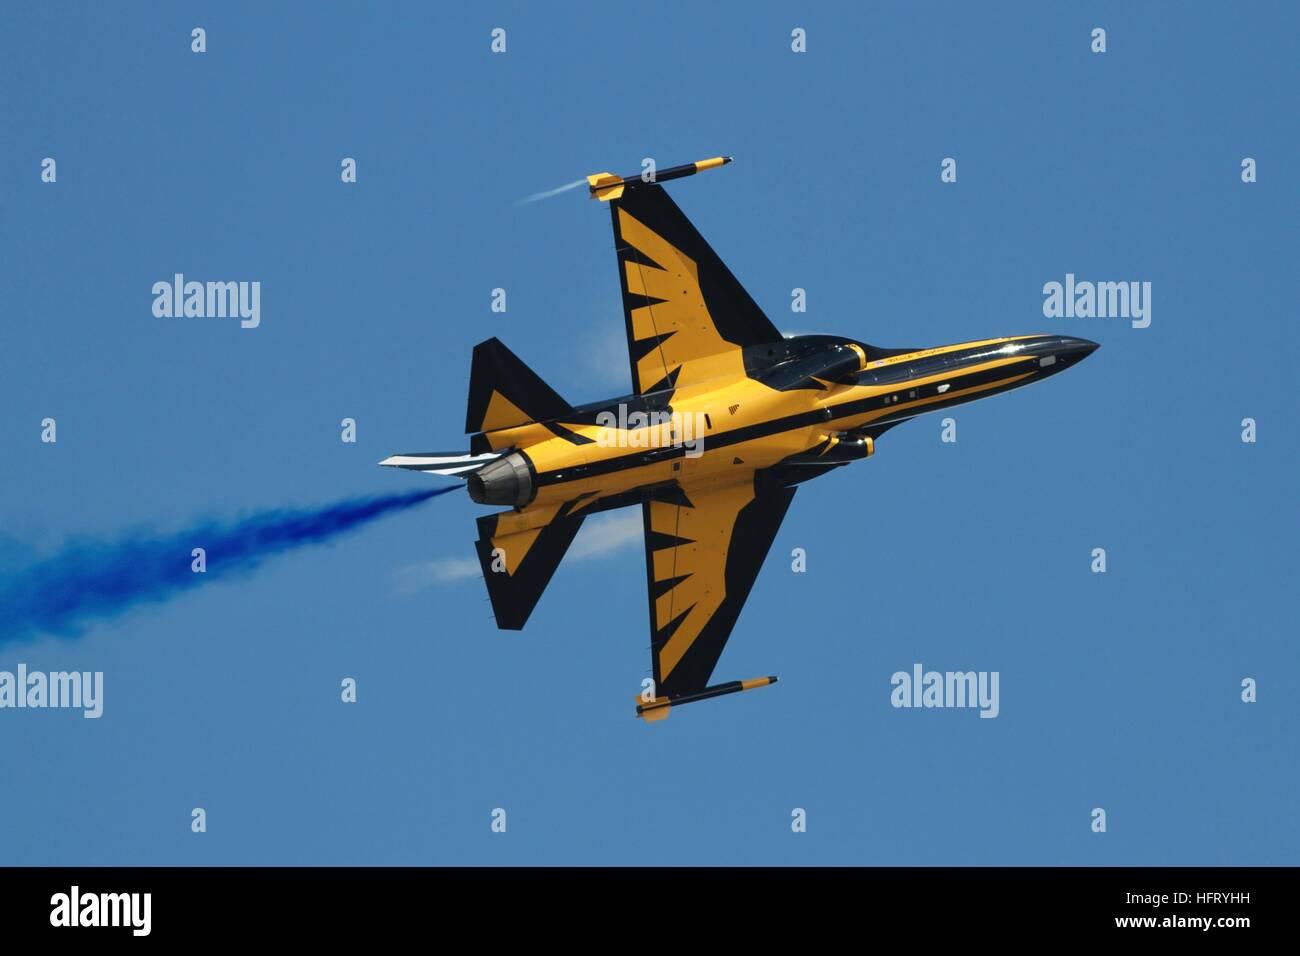 T 50 Golden Eagle Stock Photos & T 50 Golden Eagle Stock Images - Alamy